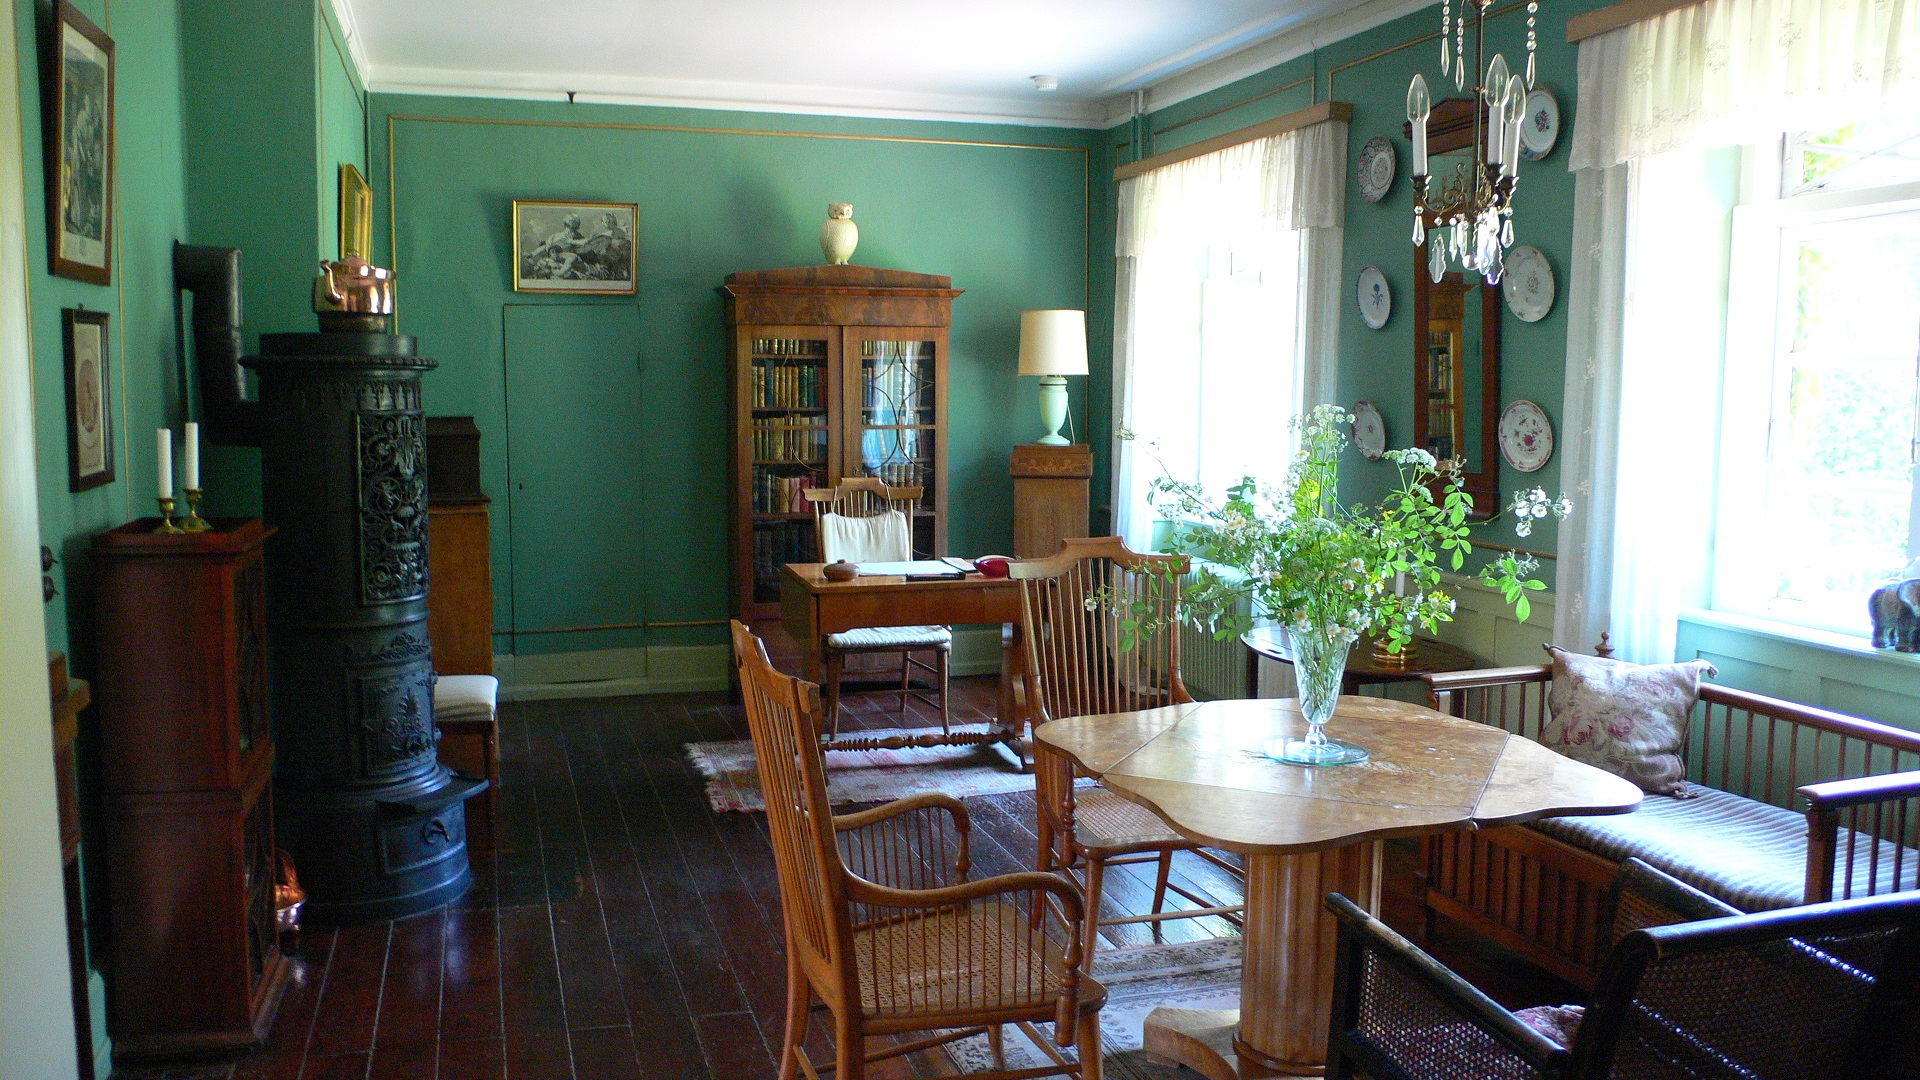 colores relajantes para dormitorio turquesa